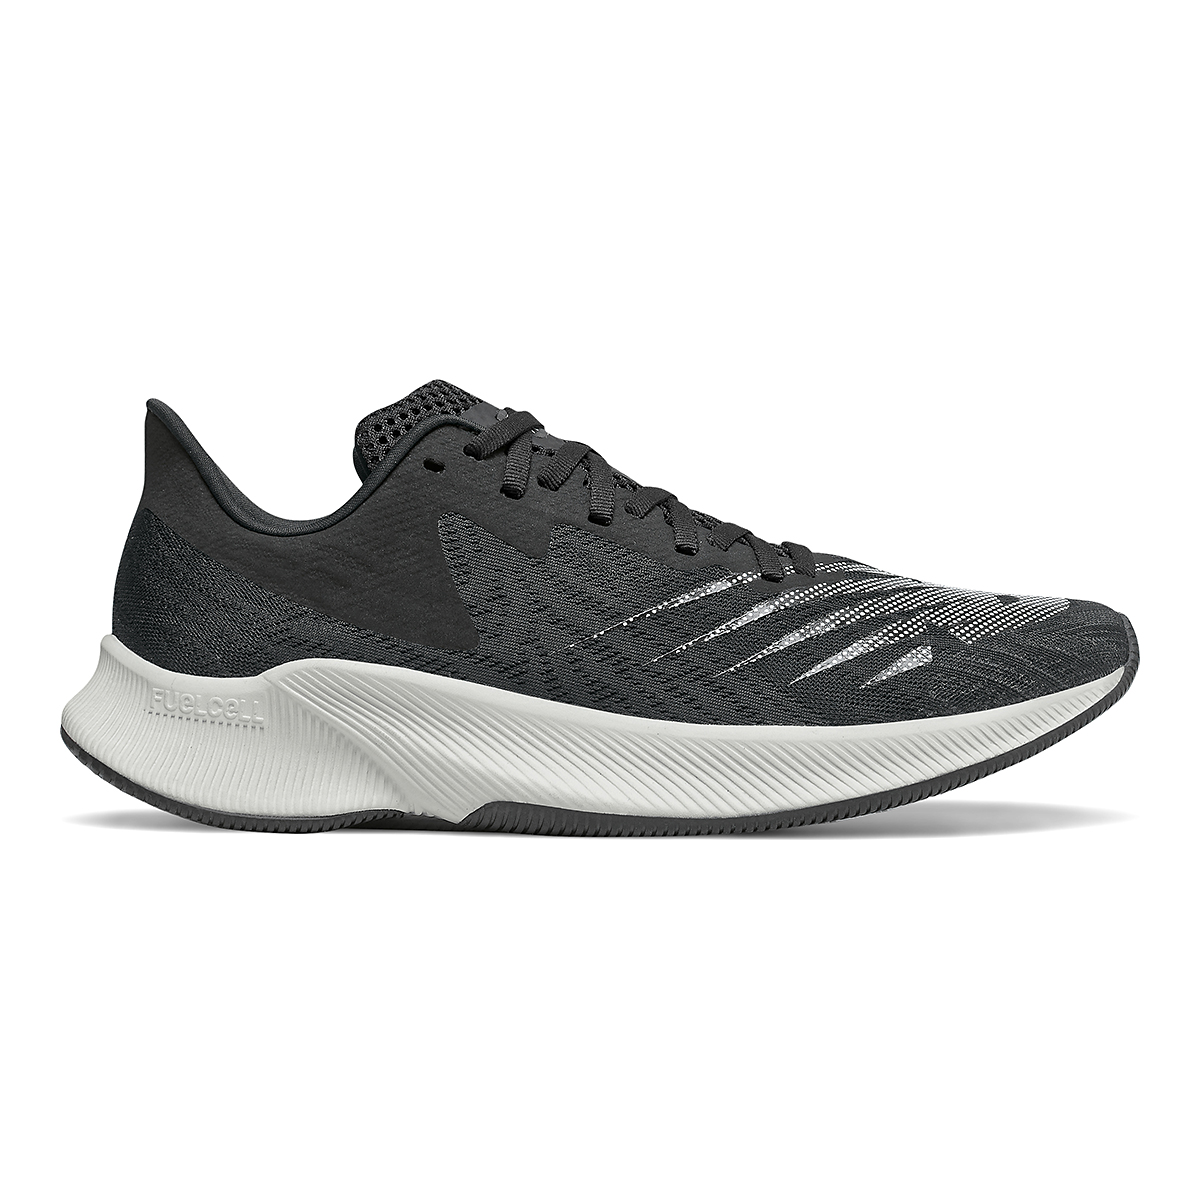 Men's New Balance Fuelcell Prism Running Shoe - Color: Black - Size: 7 - Width: Wide, Black, large, image 1